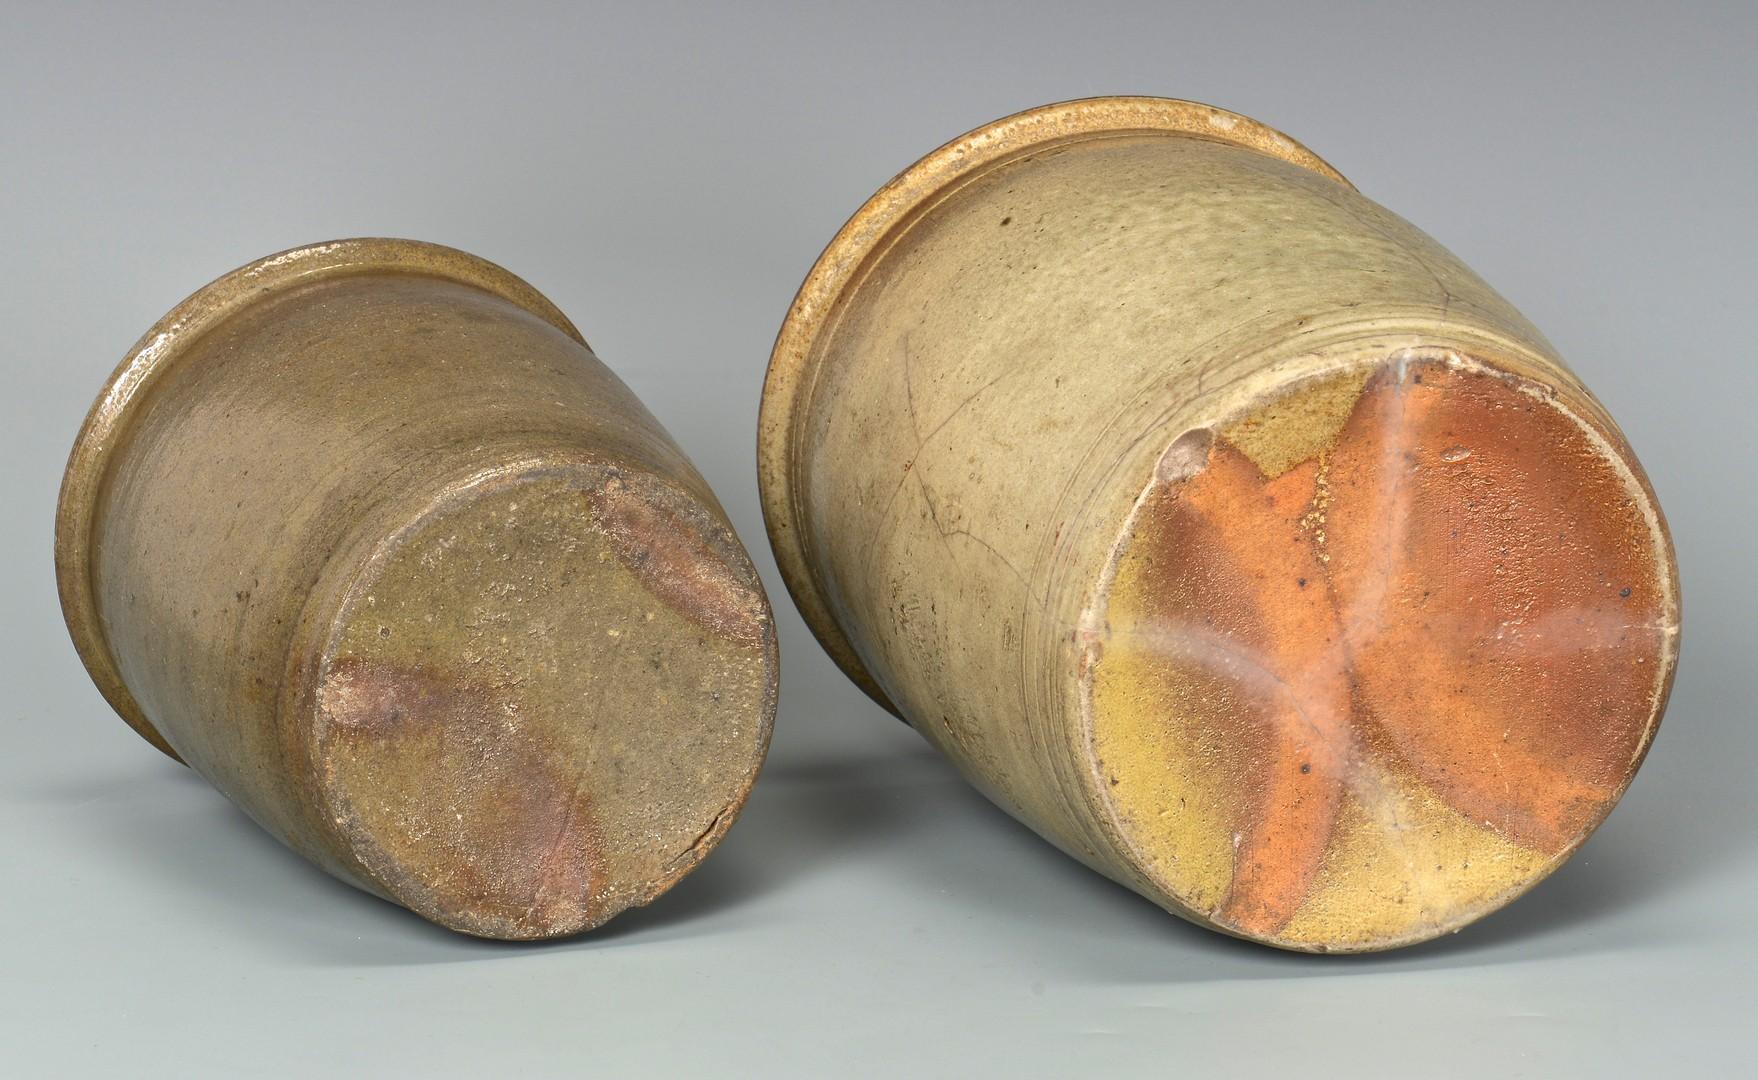 Lot 693: 2 East TN M.P. Harmon Stoneware Jars, 1 upside dow